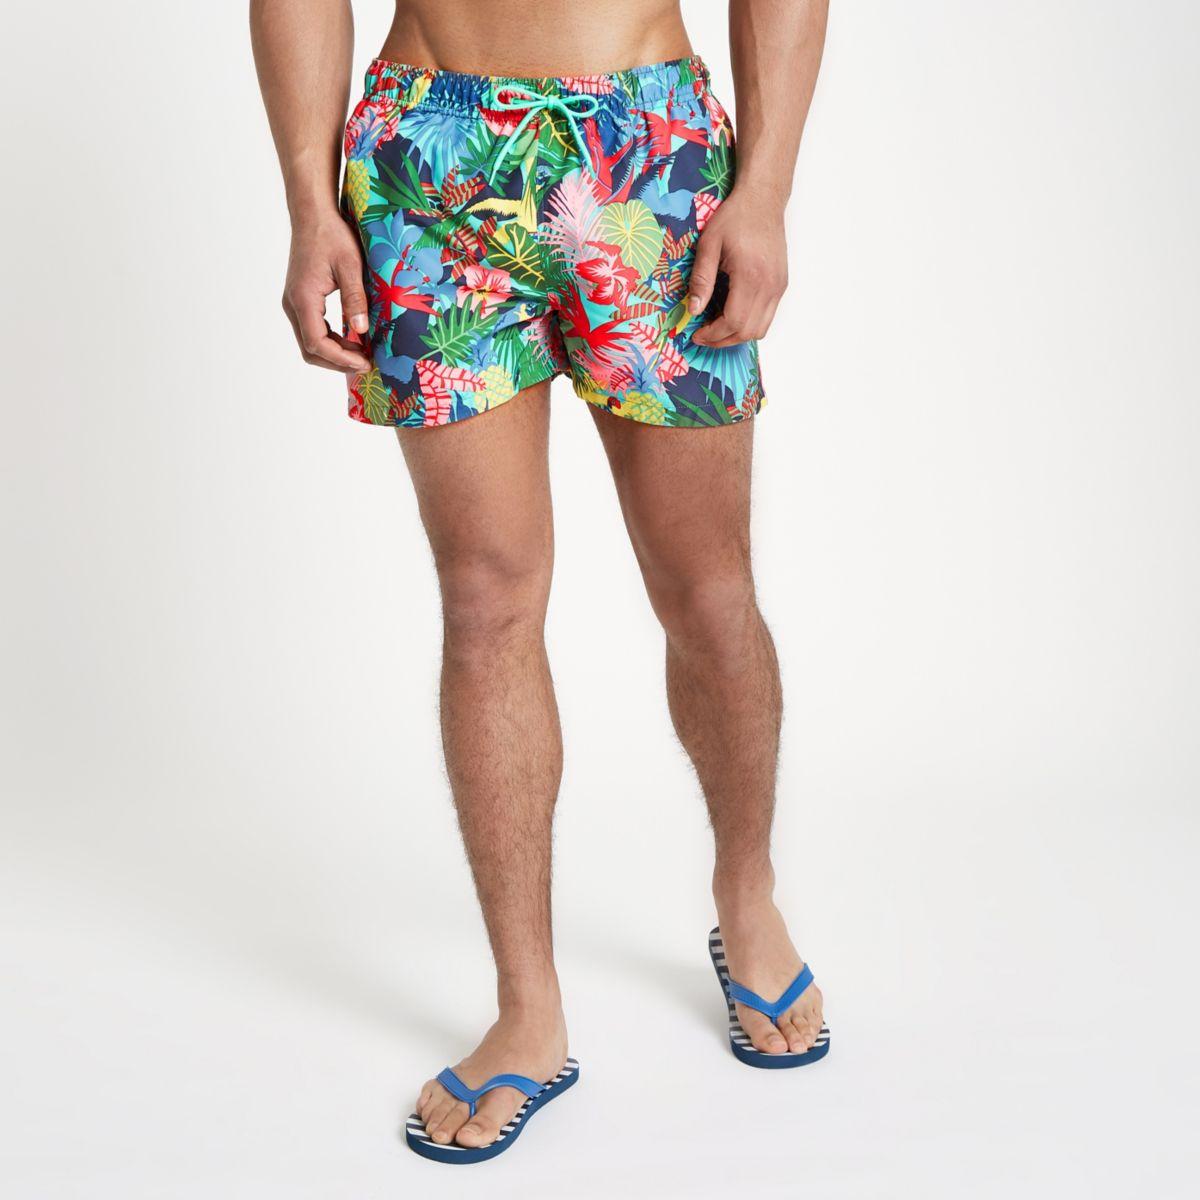 Find Great Online Buy Online Cheap Mens Green jungle print short swim shorts River Island Huge Surprise IGTteLn5